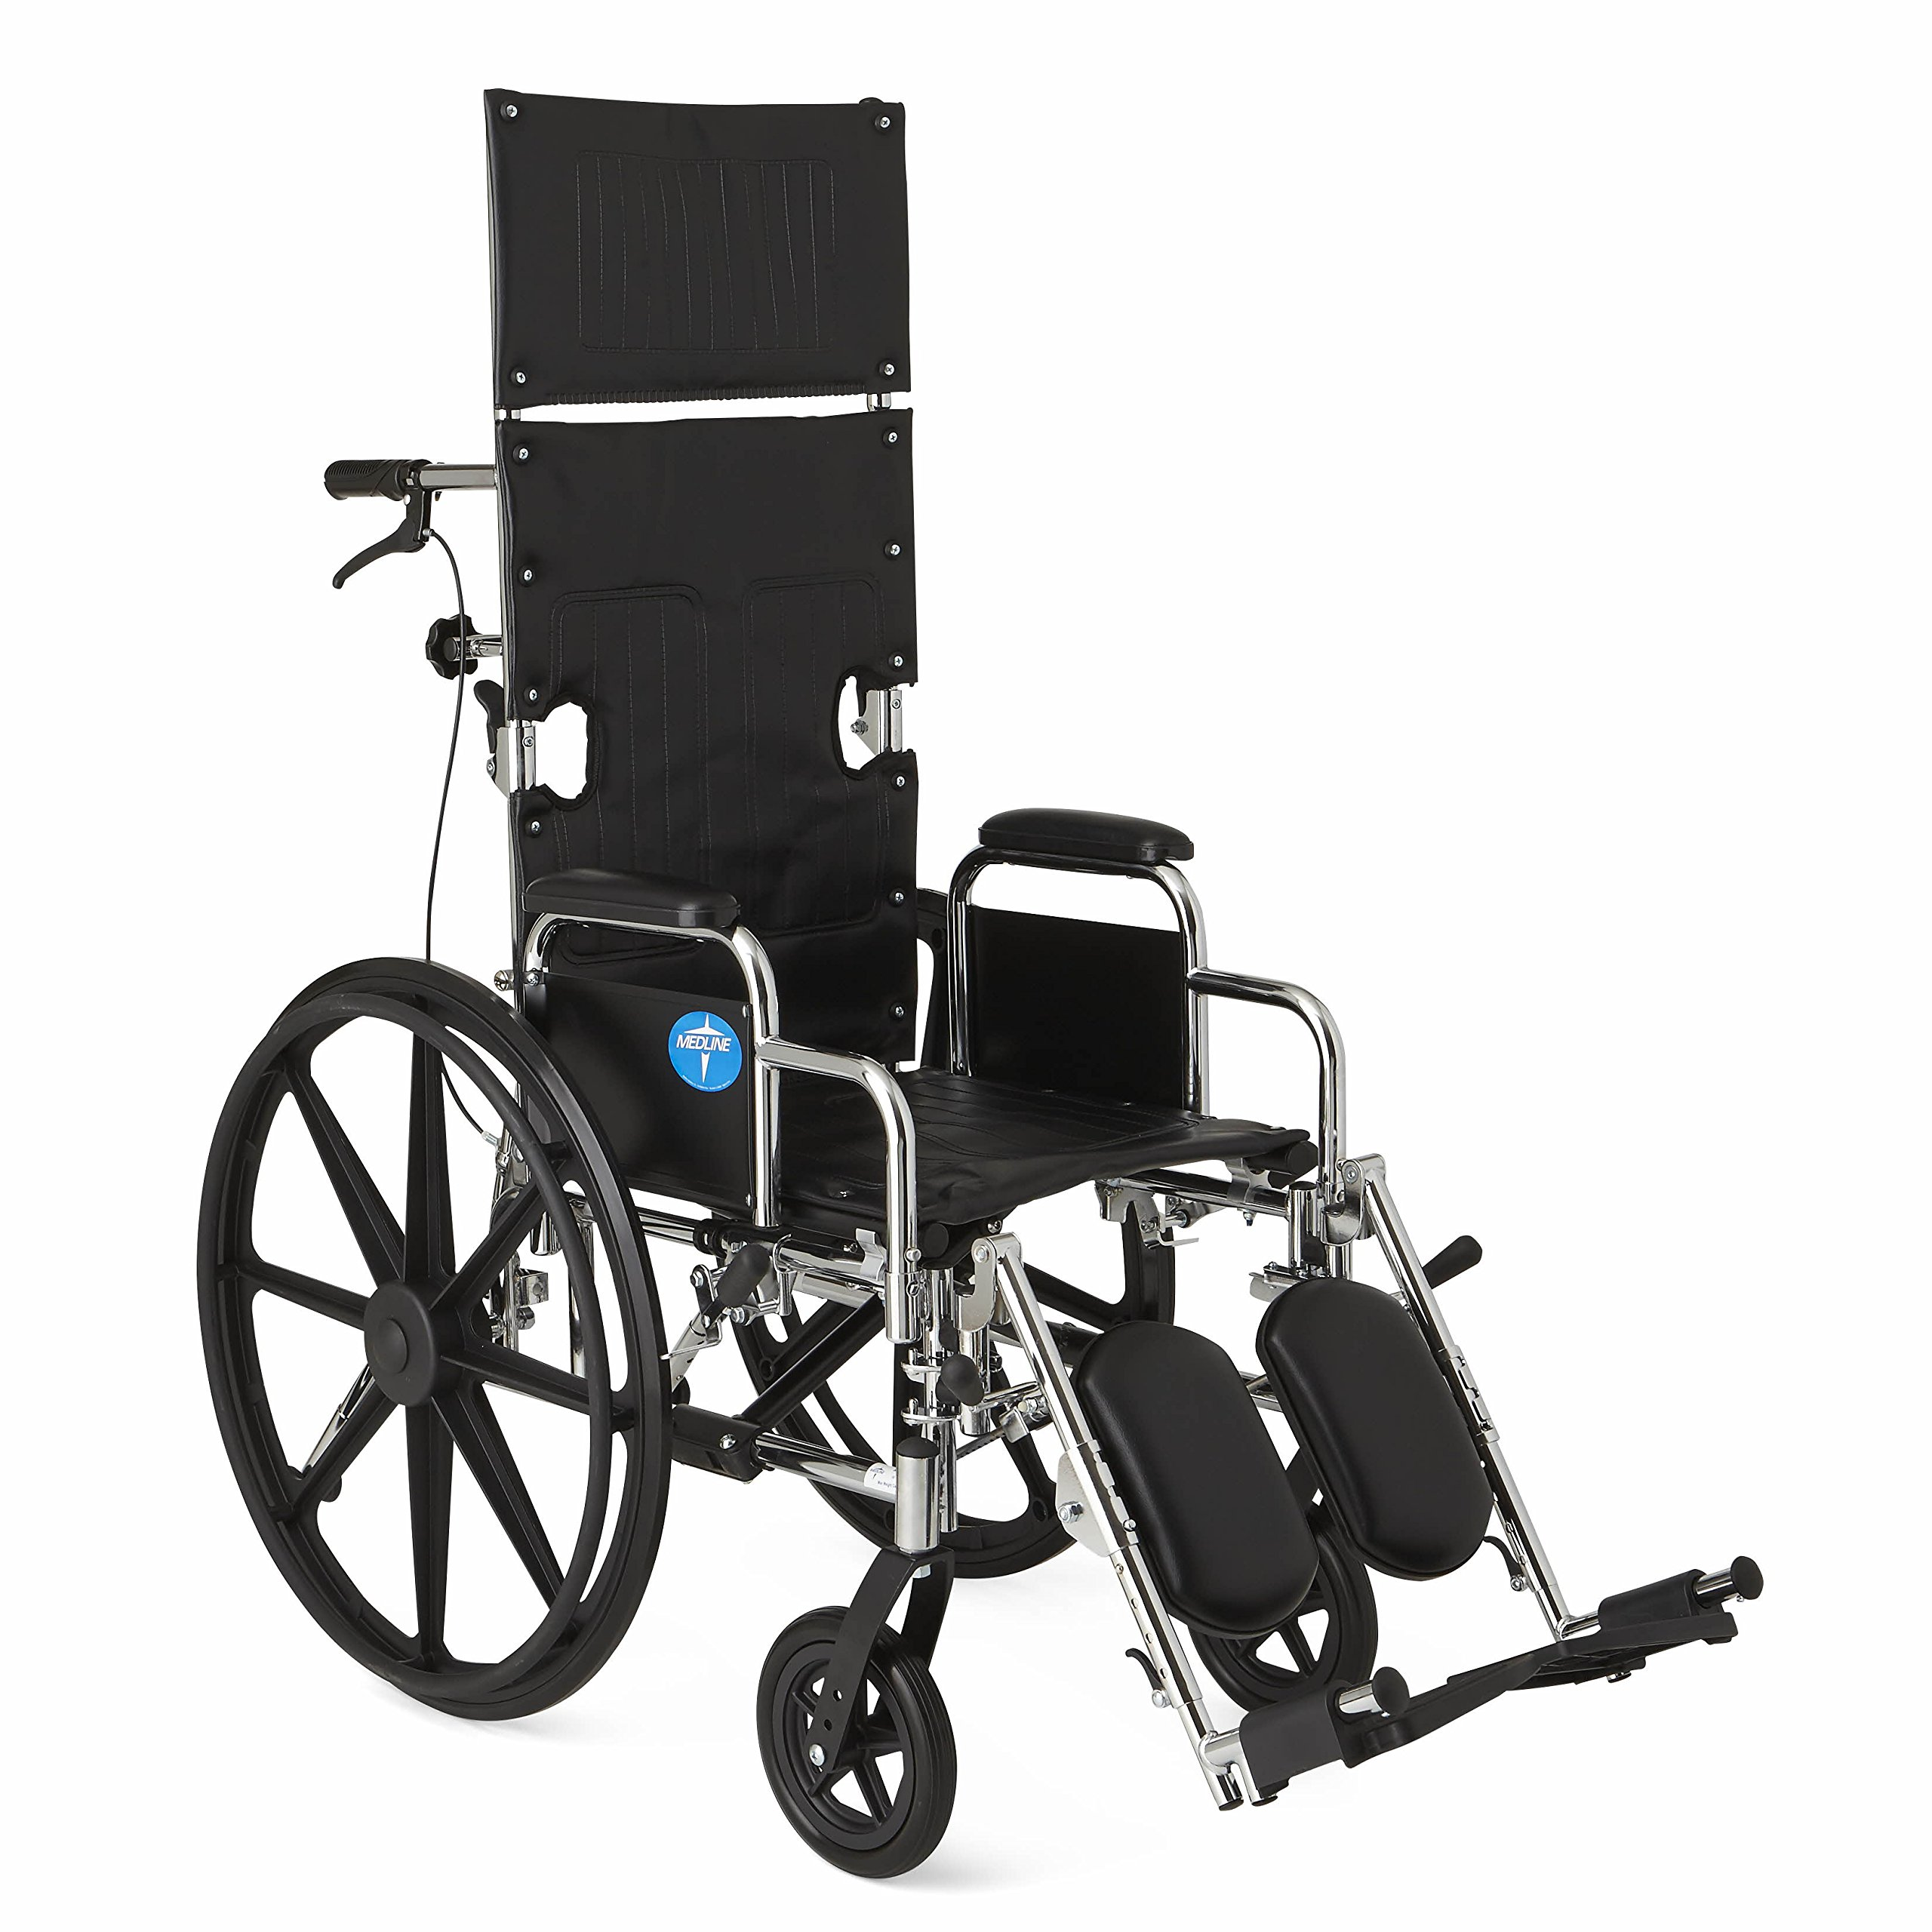 Medline Reclining Wheelchair, 20'' Wide Seat, Desk Length Arms, Elevating Legrests, Chrome Frame